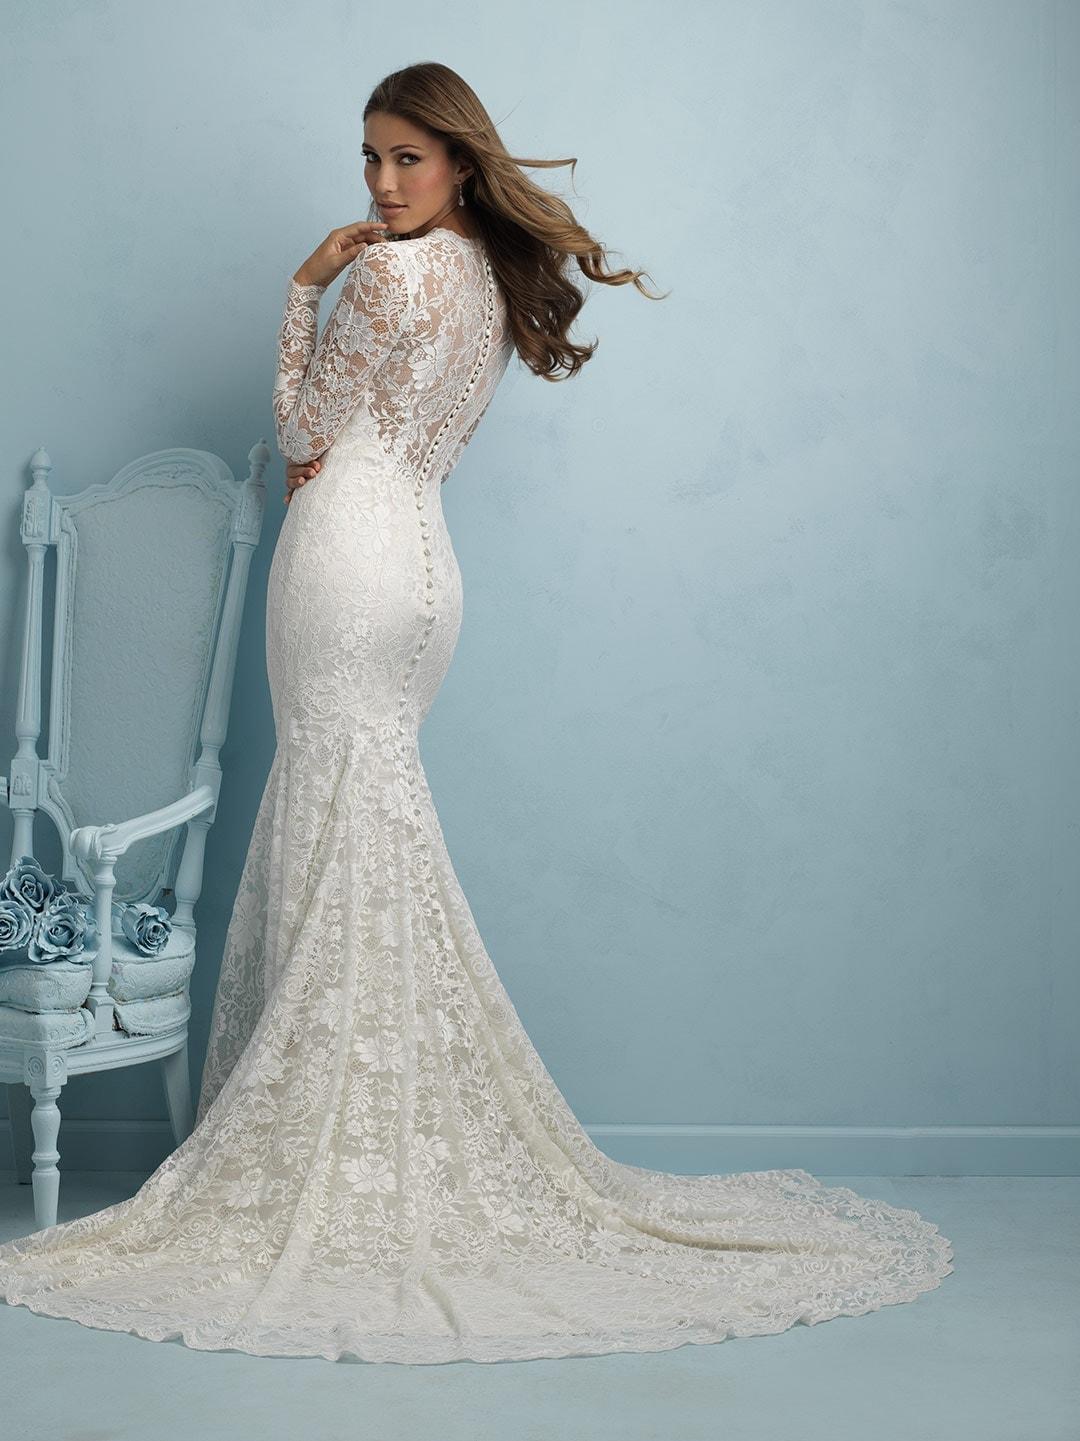 embrace bridal geelong 9213b